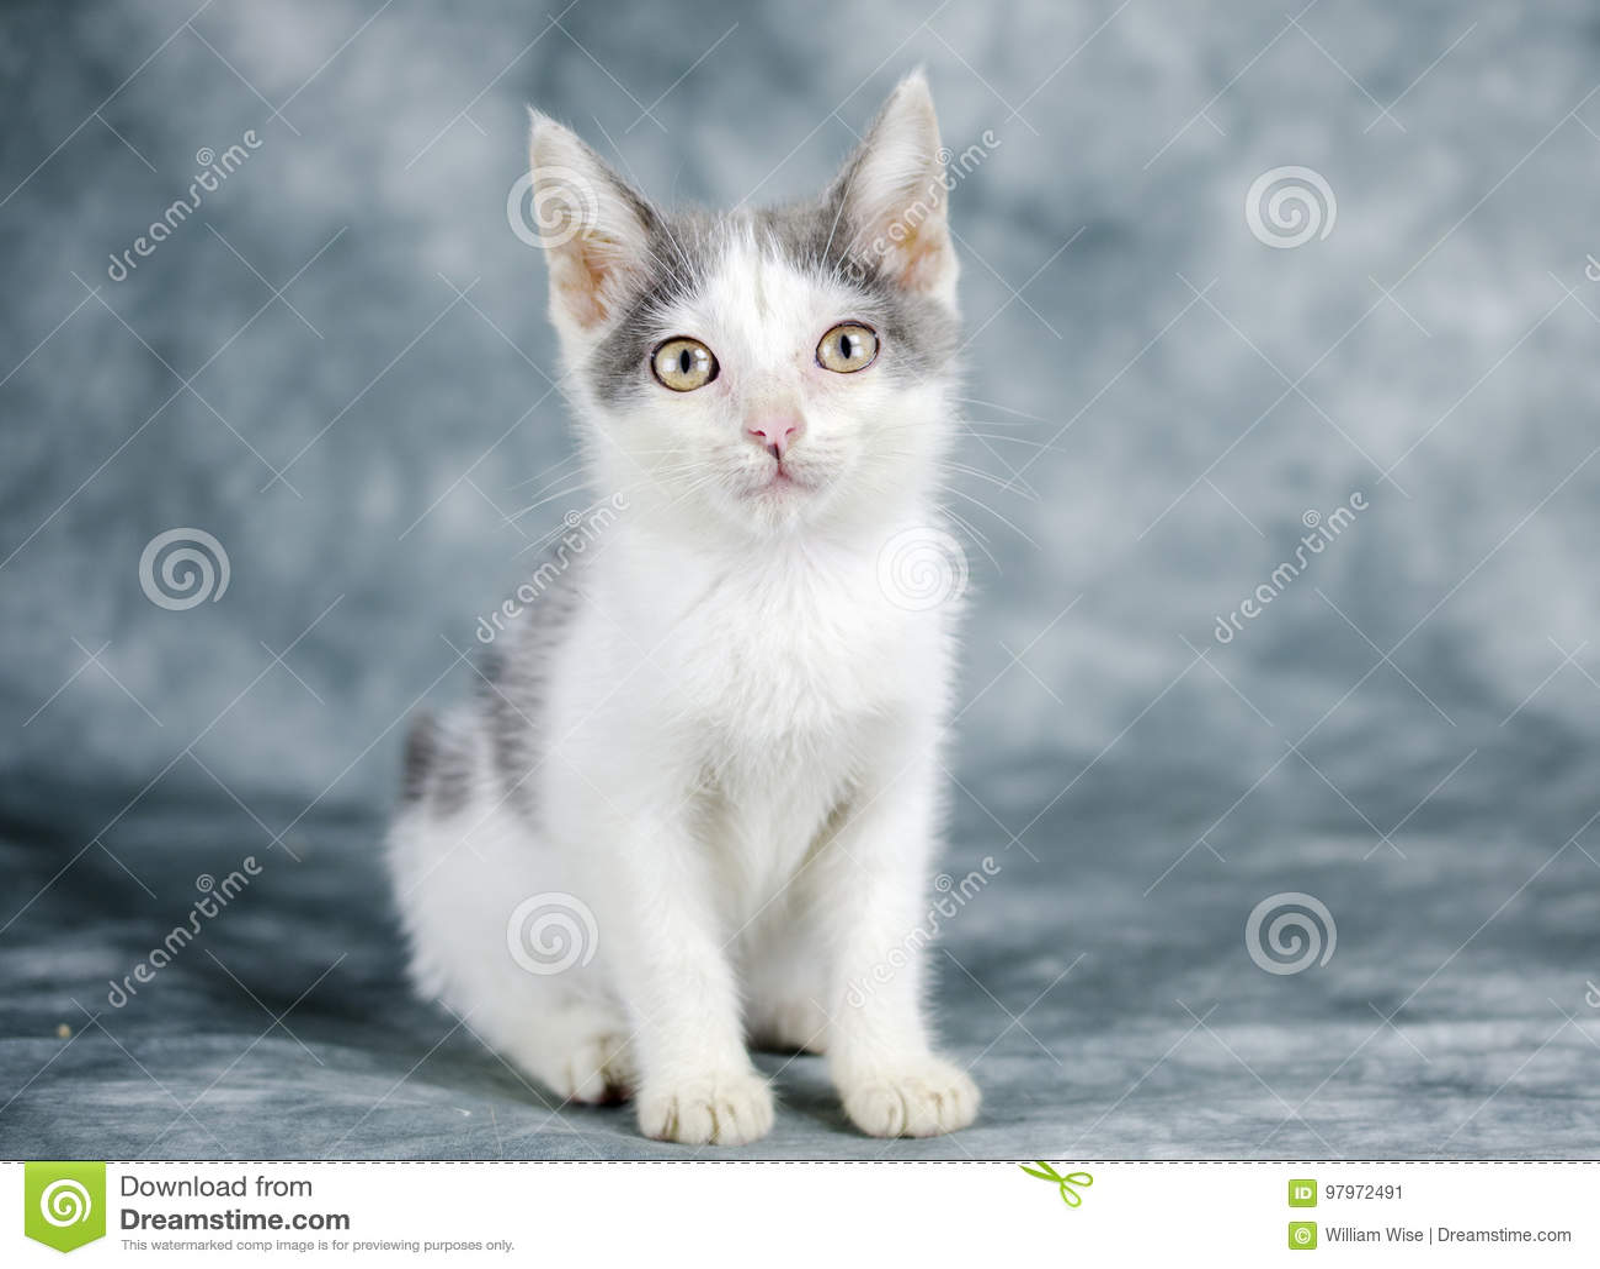 Gray And White Kitten Cat Stock Image Image Of Gray 97972491